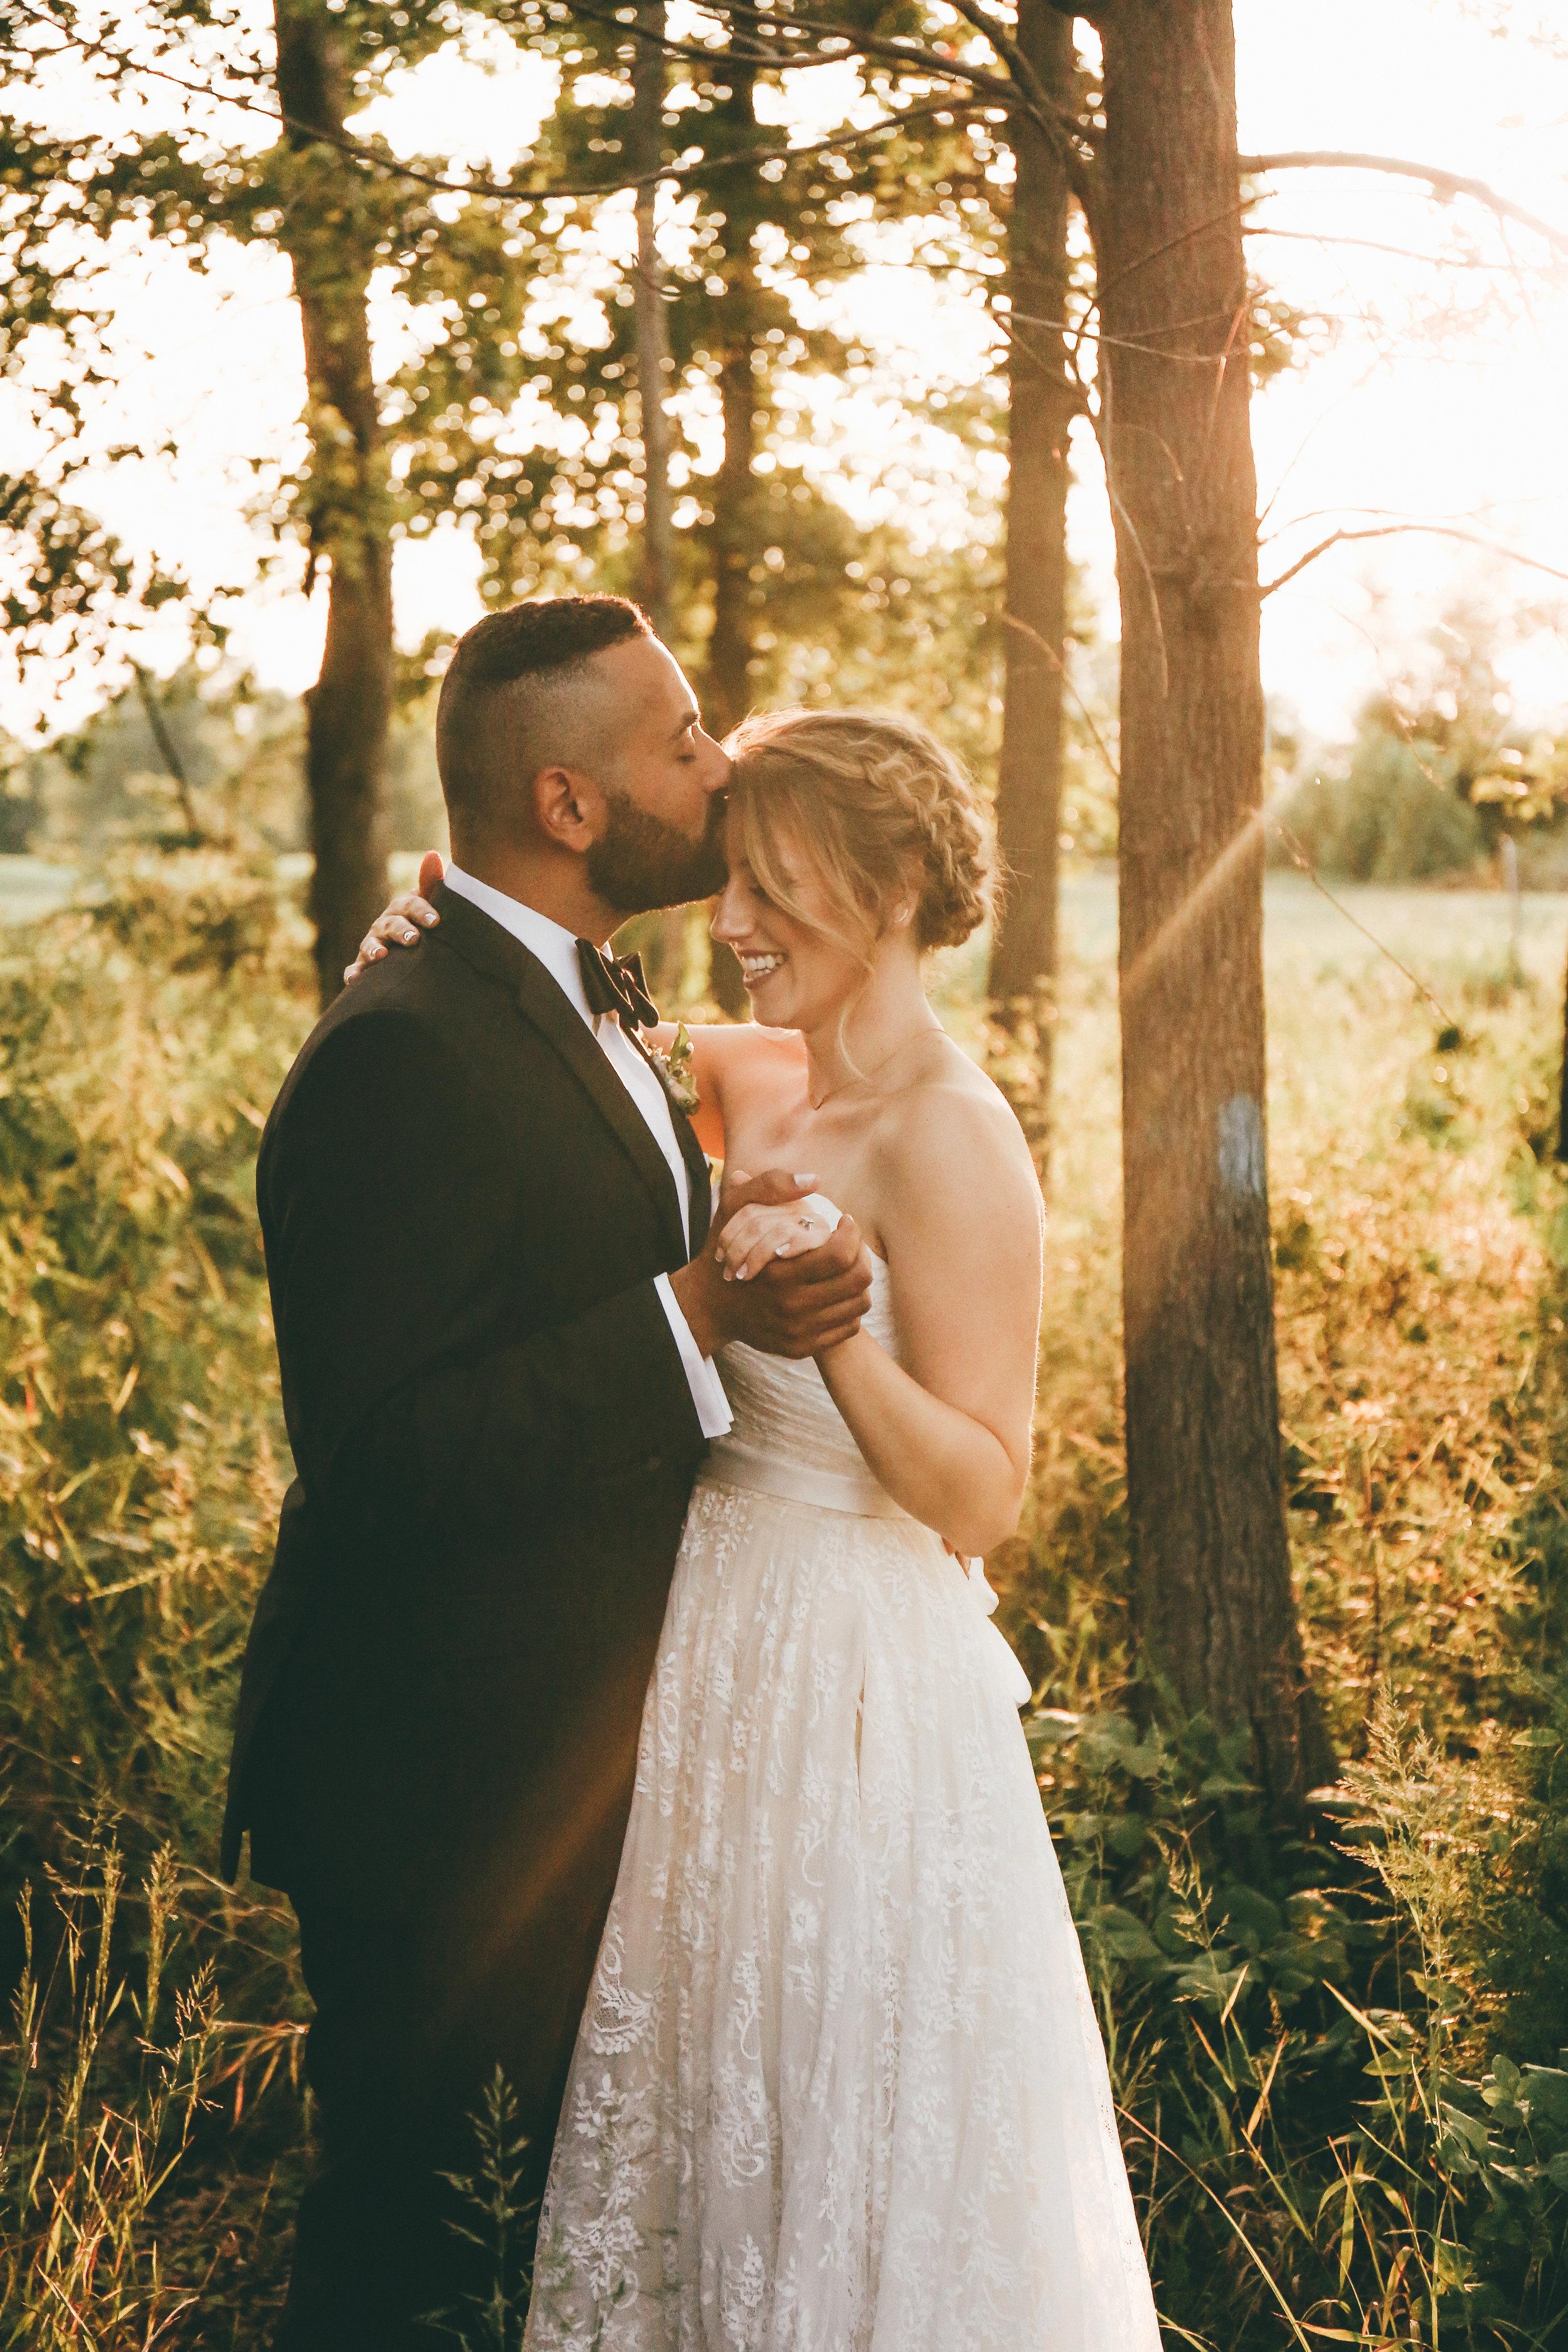 BaileyMena_Married - 419.jpg